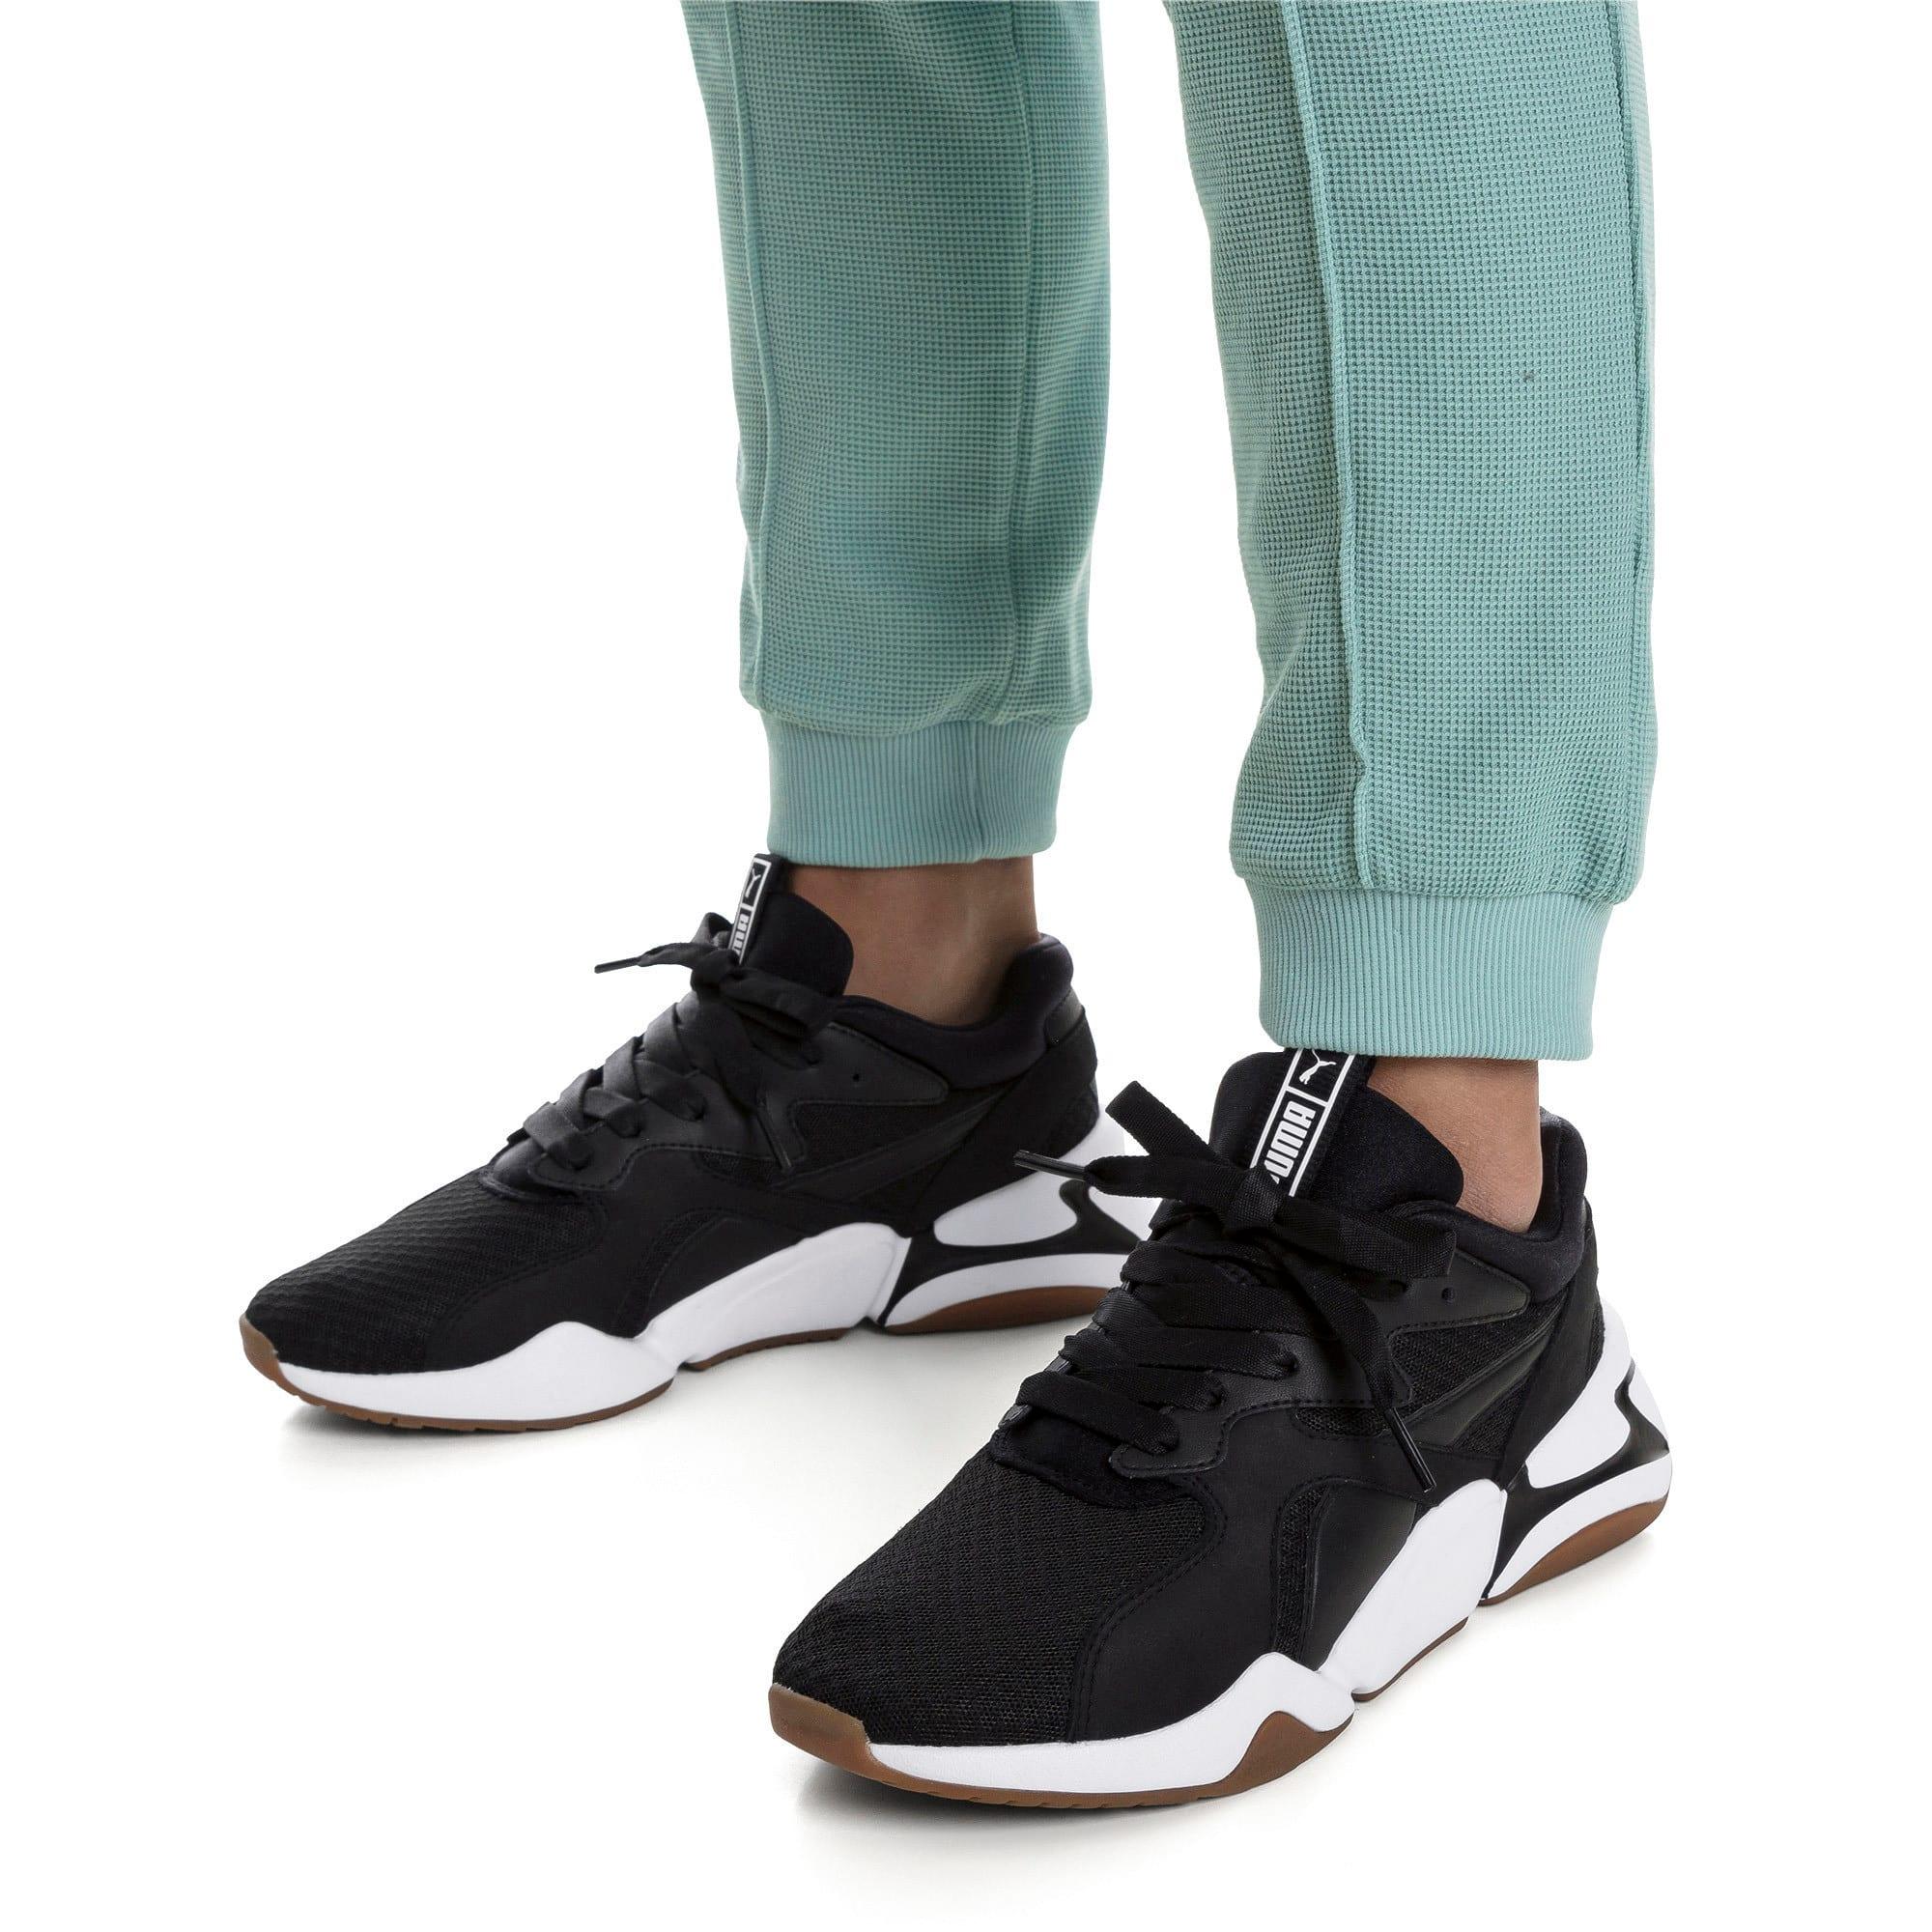 Thumbnail 2 of Nova '90s Bloc Women's Sneakers, Puma Black-Puma Black, medium